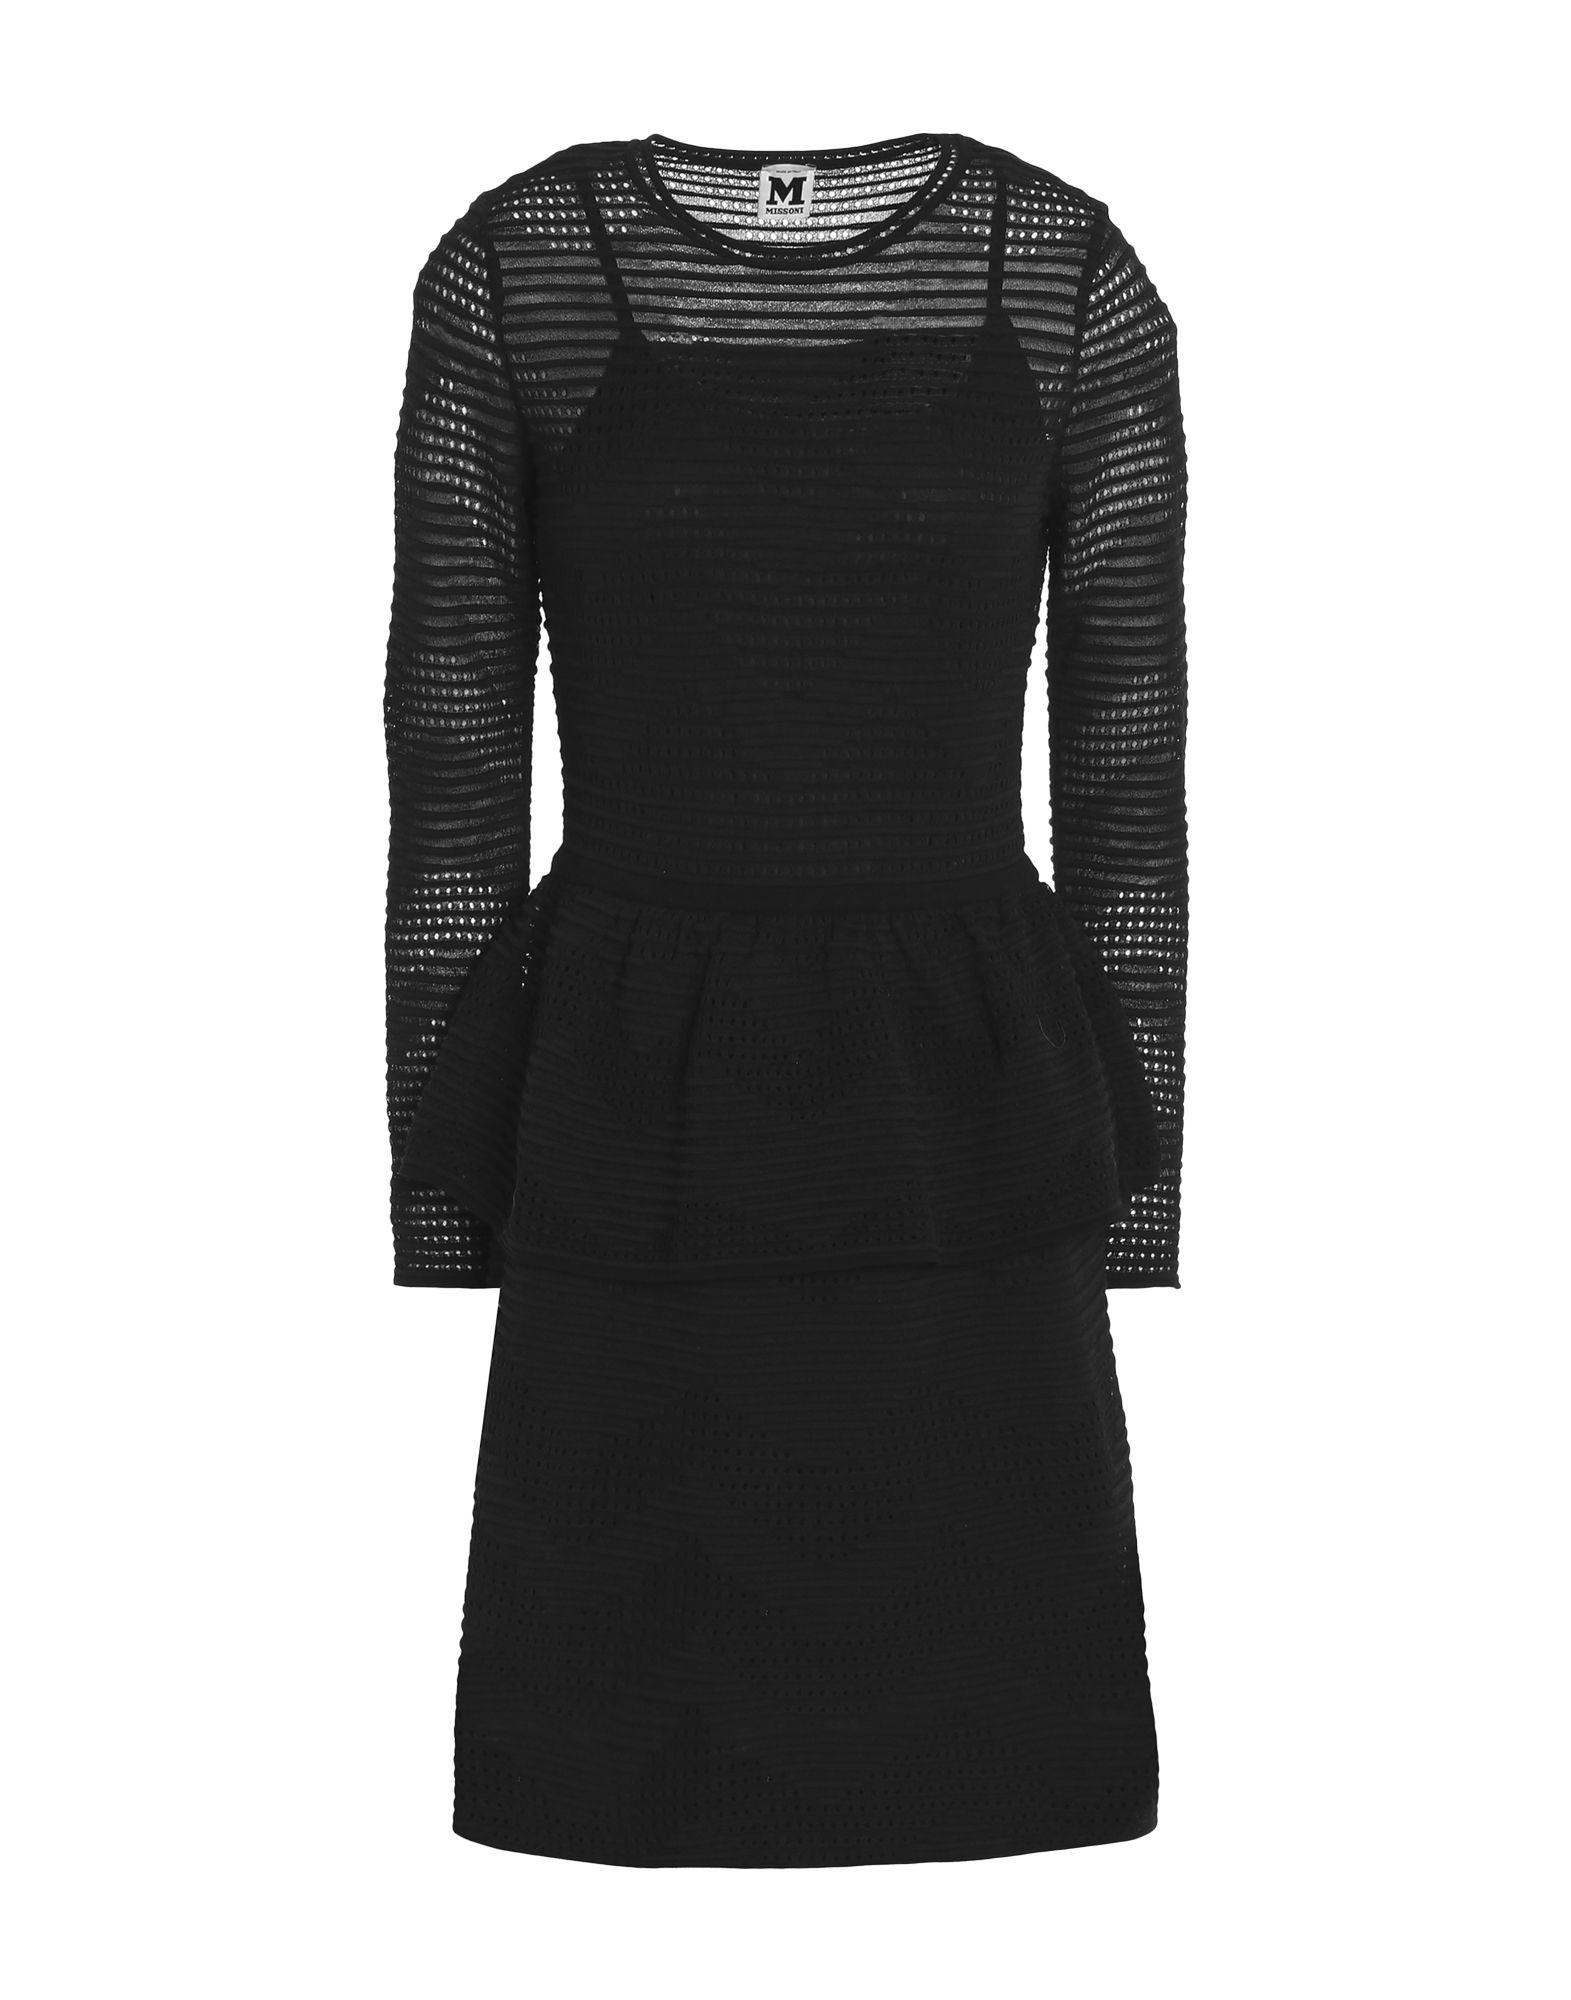 52d90e4e3b2 Φορέματα Missoni Γυναίκα Κολεξιόν Άνοιξη-Καλοκαίρι και Φθινόπωρο ...